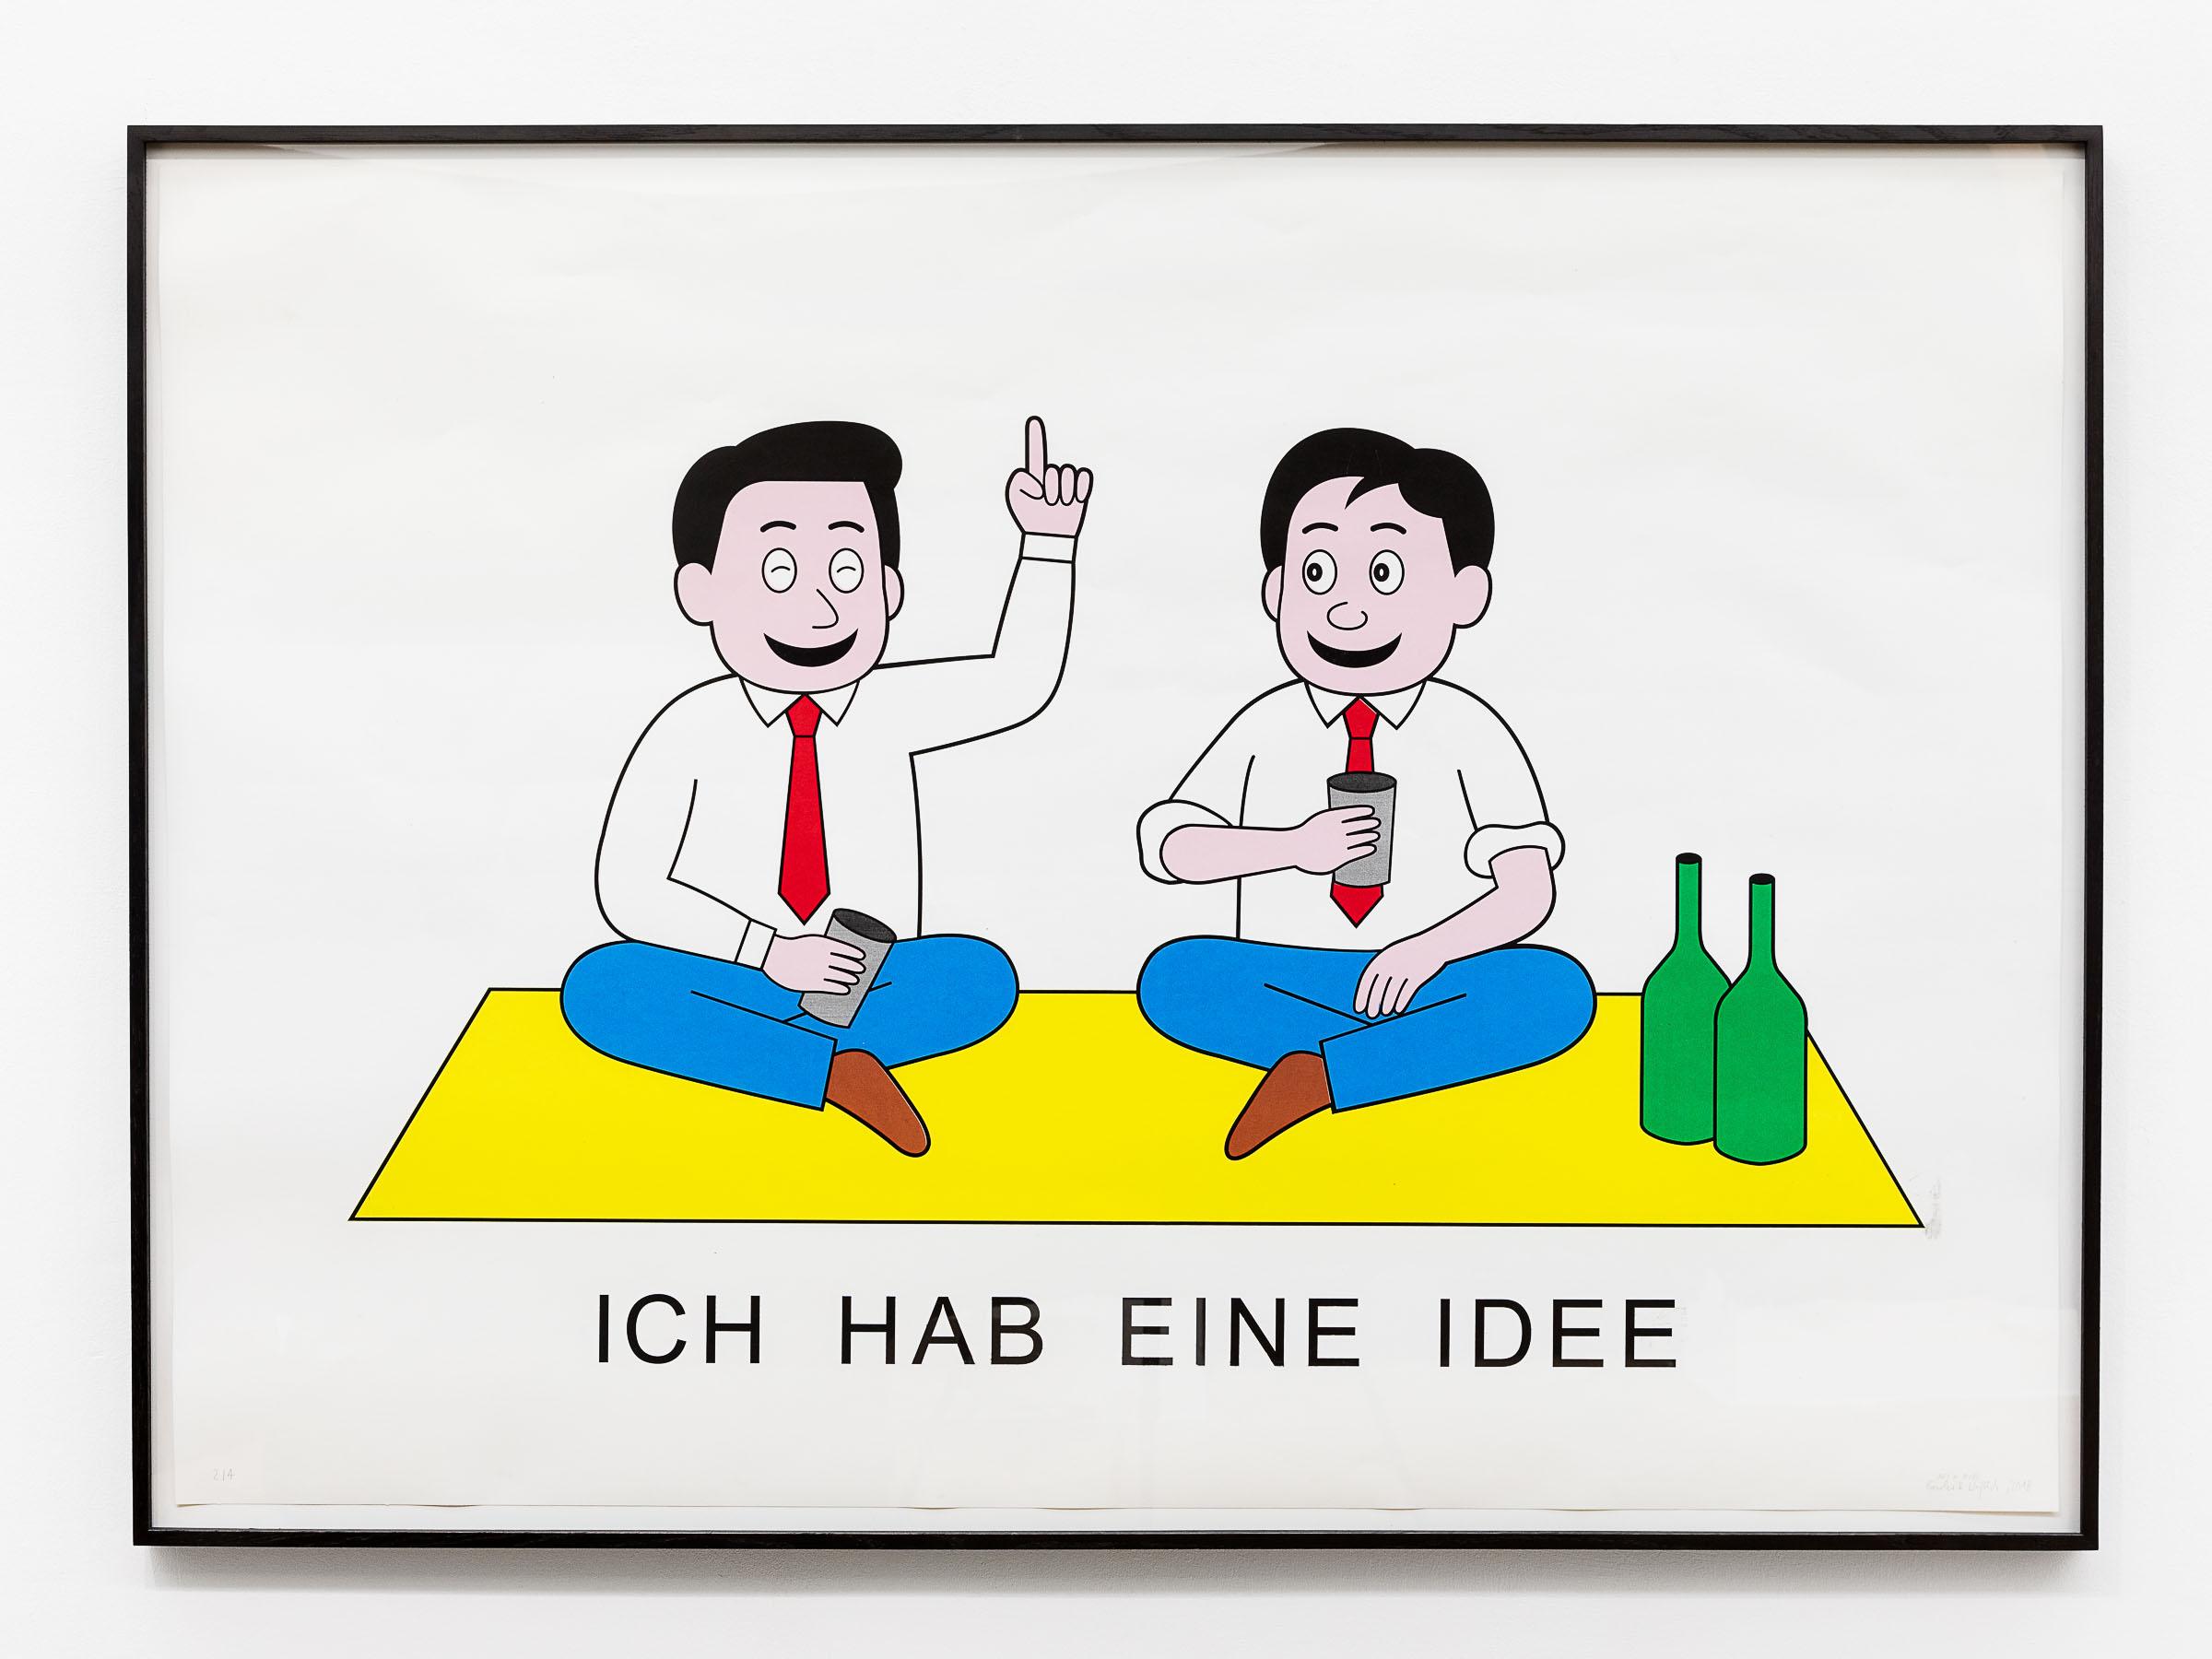 ART N MORE, Ich hab eine Idee, 2018, silkscreen, 100 x 140 cm